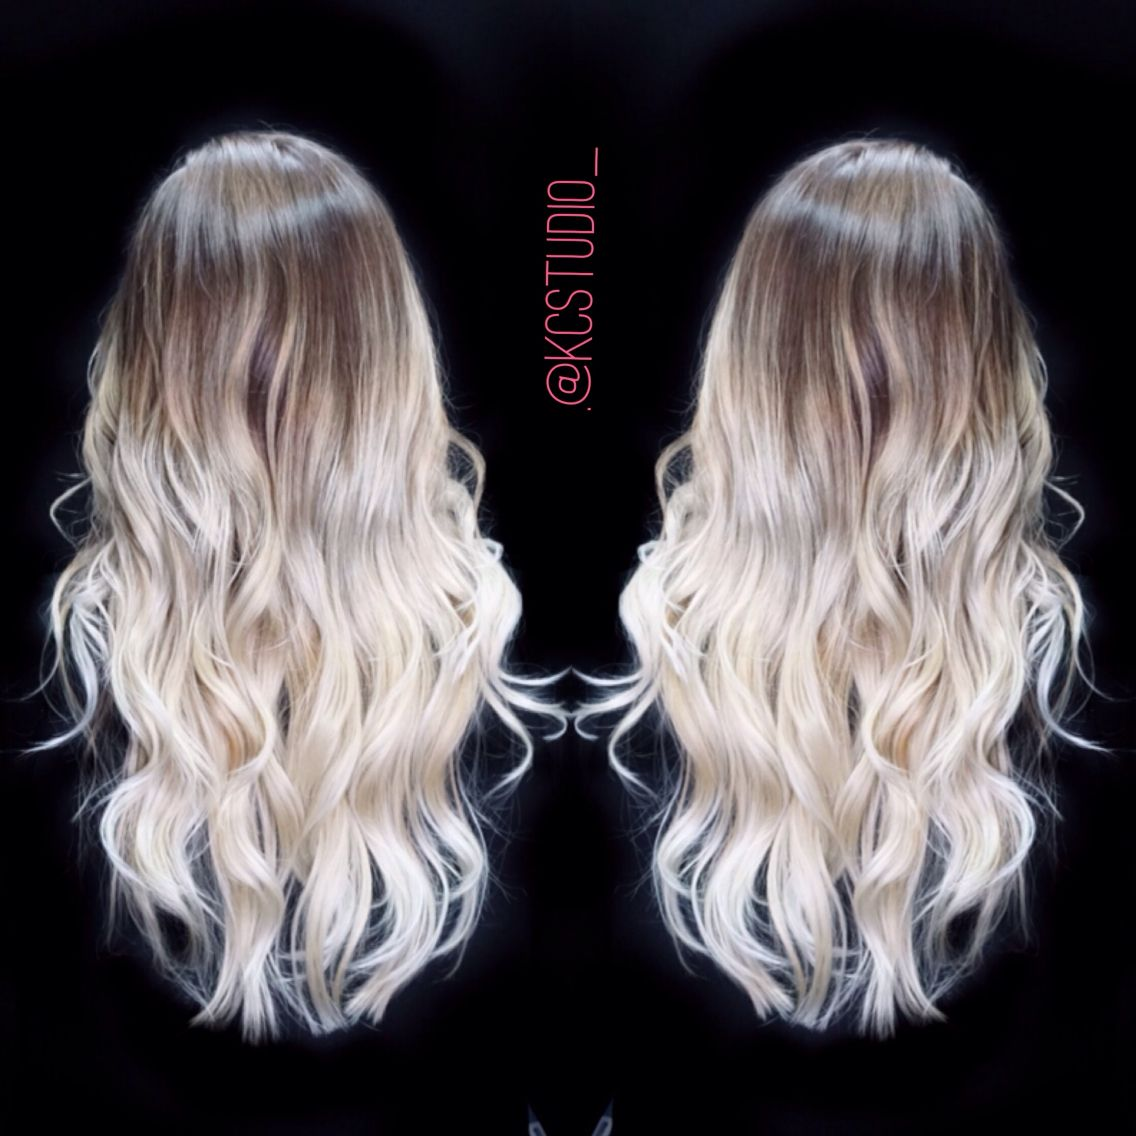 icy blonde ombre hair color hair haarfarben. Black Bedroom Furniture Sets. Home Design Ideas